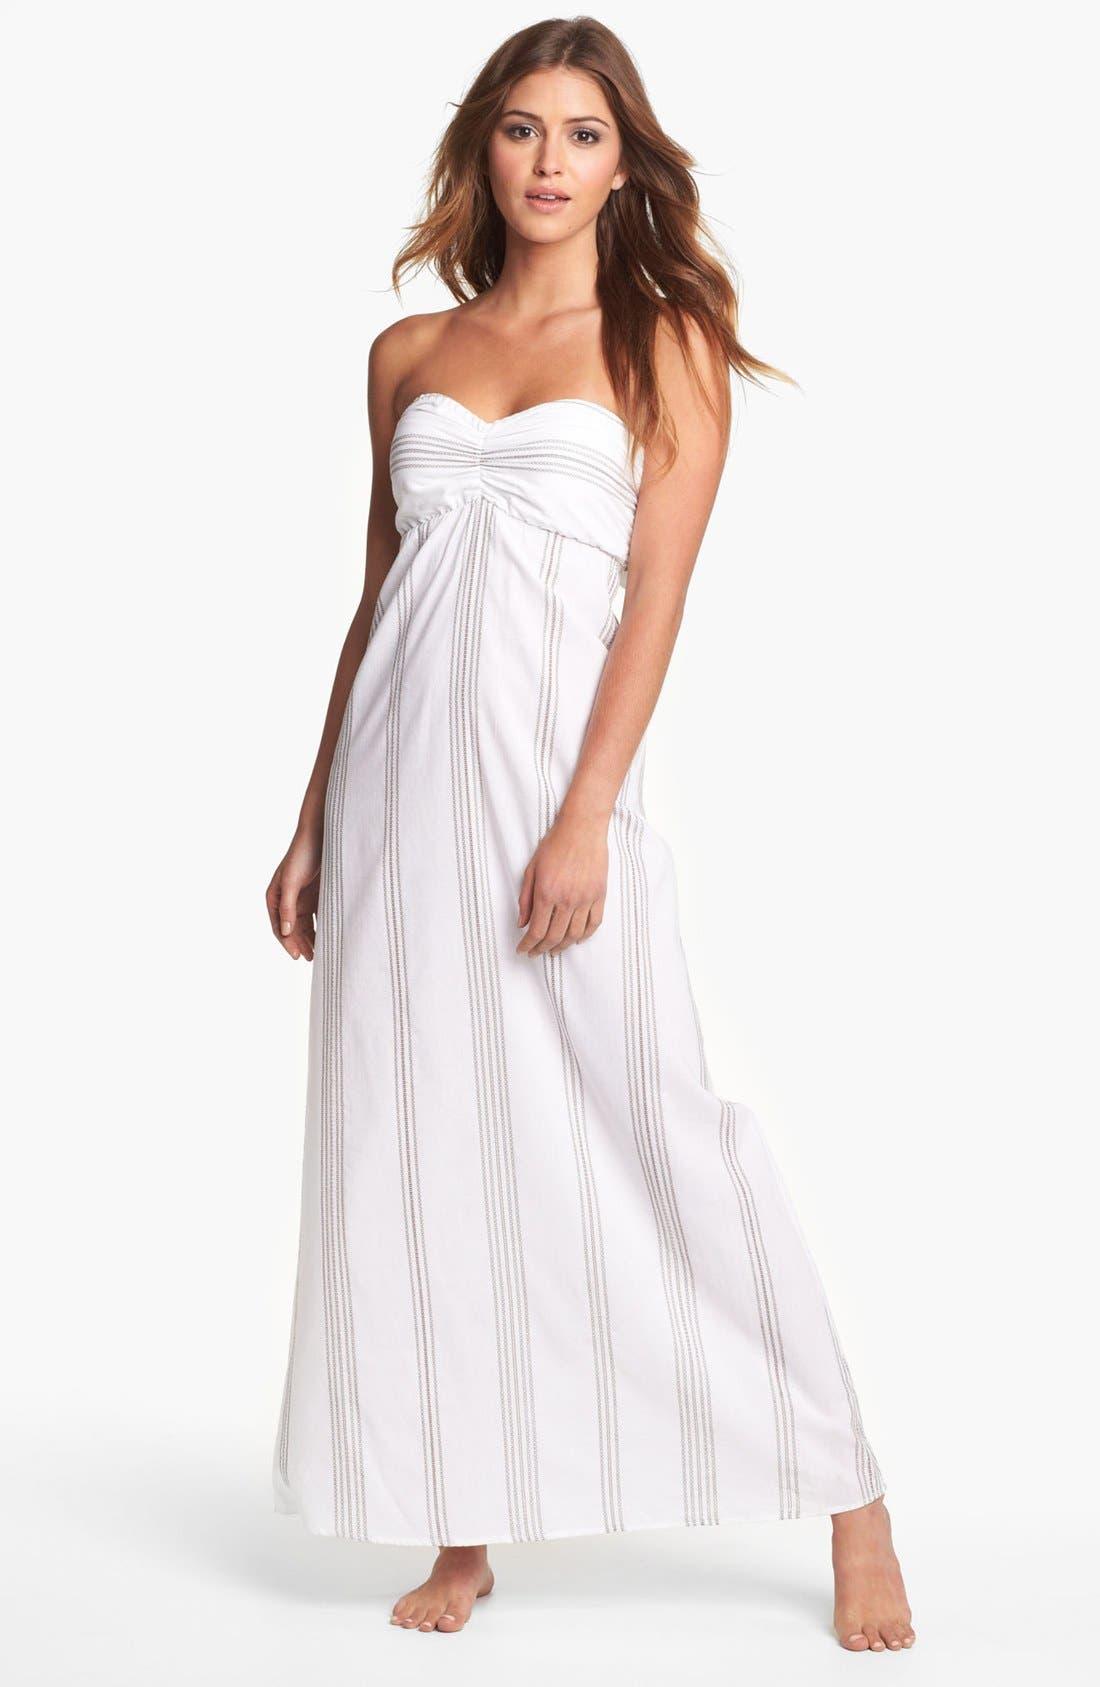 Main Image - Tommy Bahama 'Marina Stripe' Bandeau Cover-Up Dress